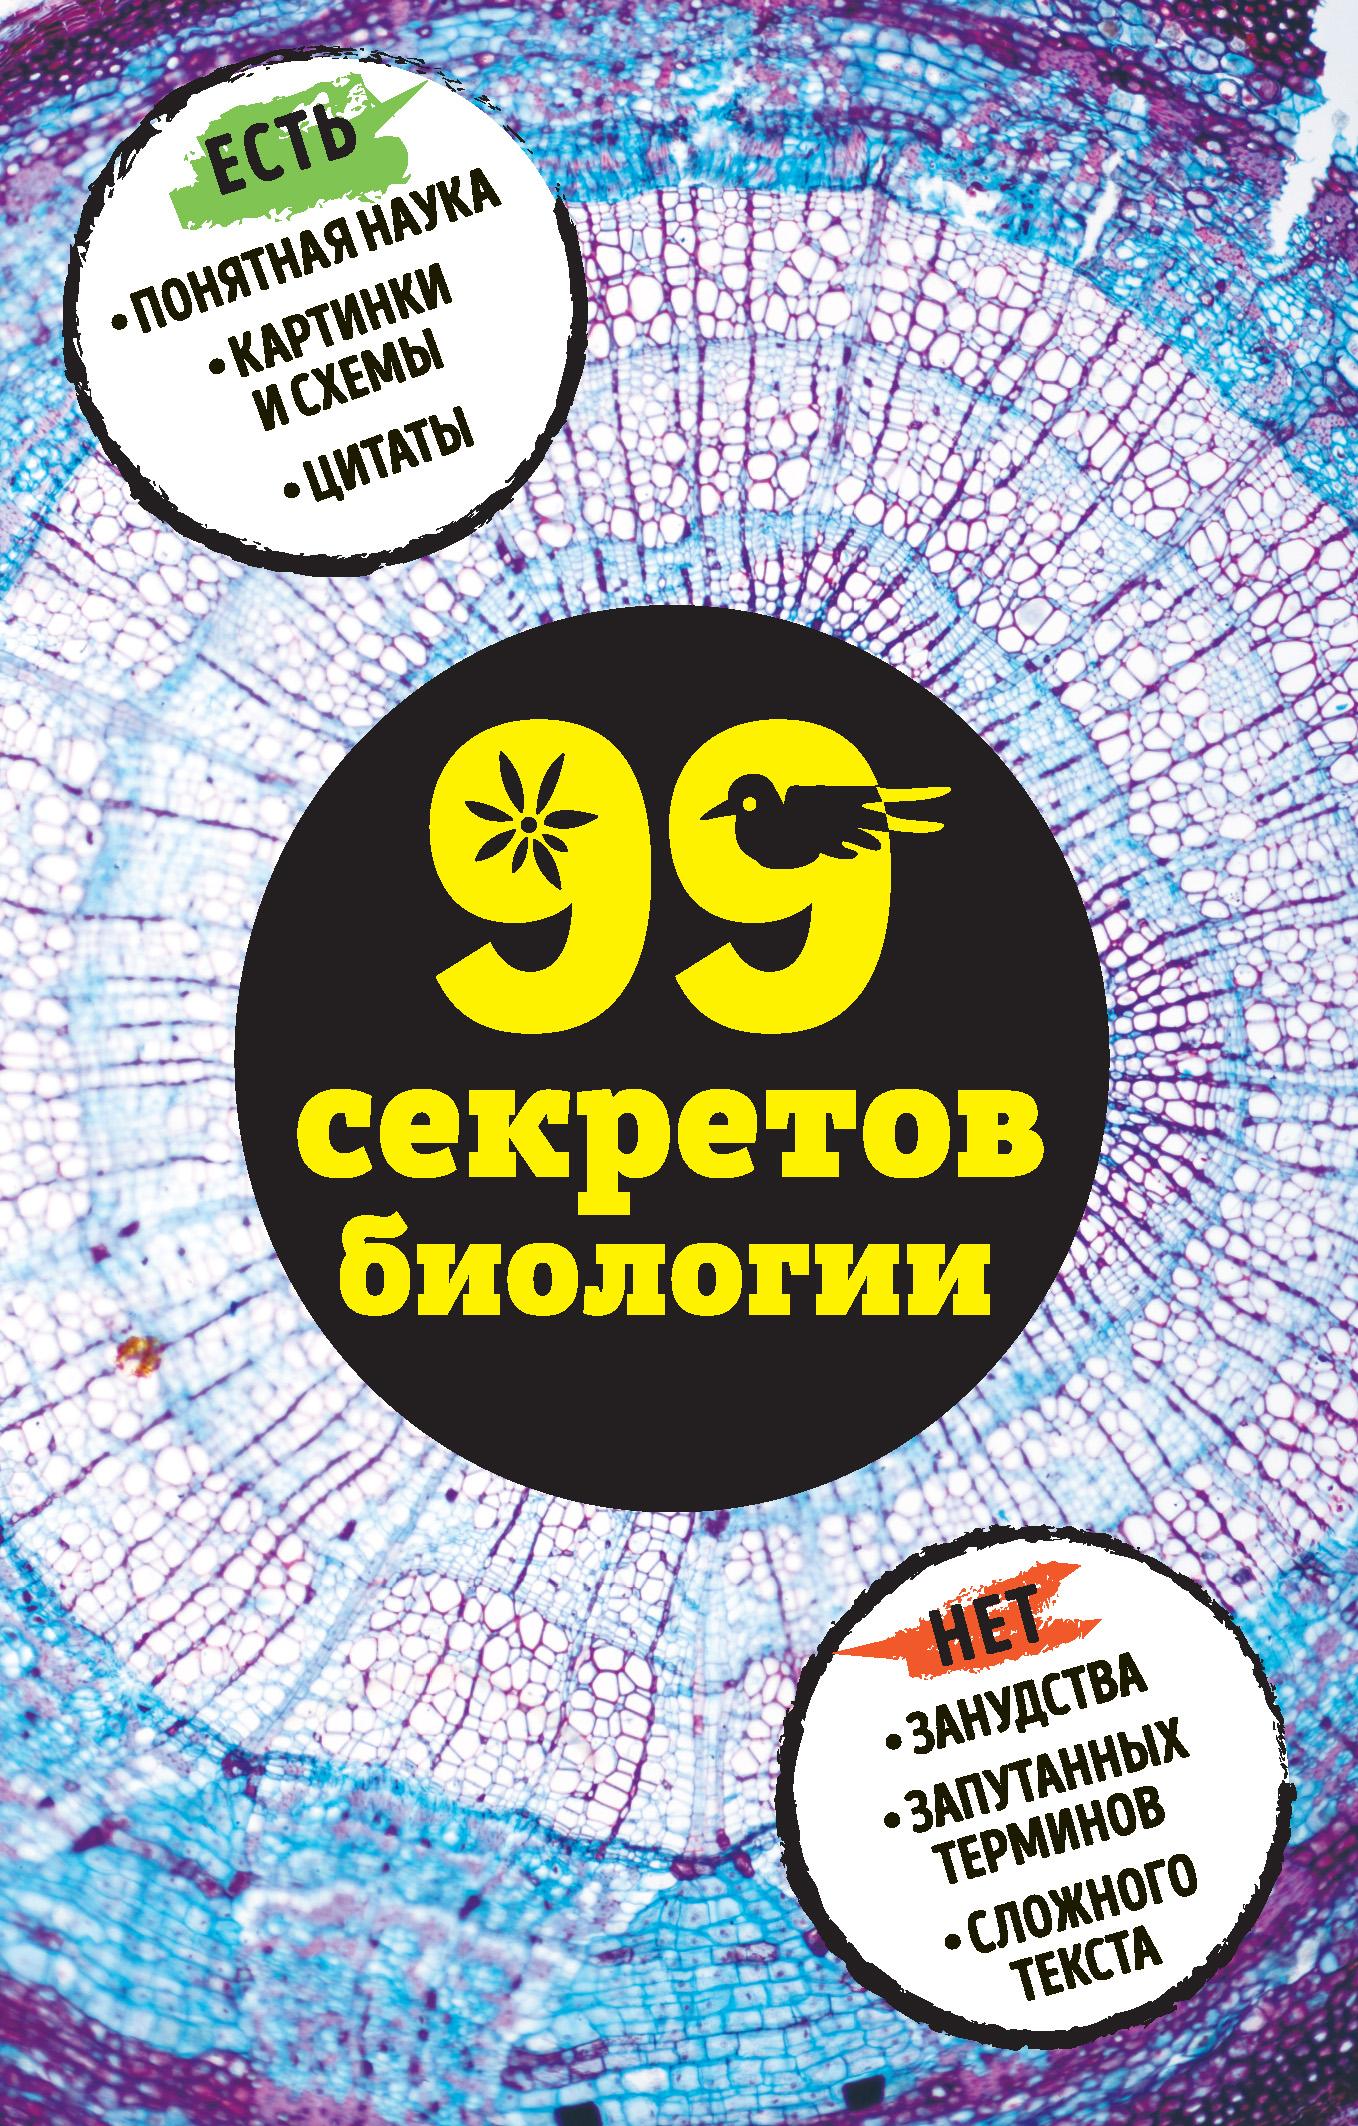 Наталья Сердцева 99 секретов биологии сердцева н 99 секретов астрономии